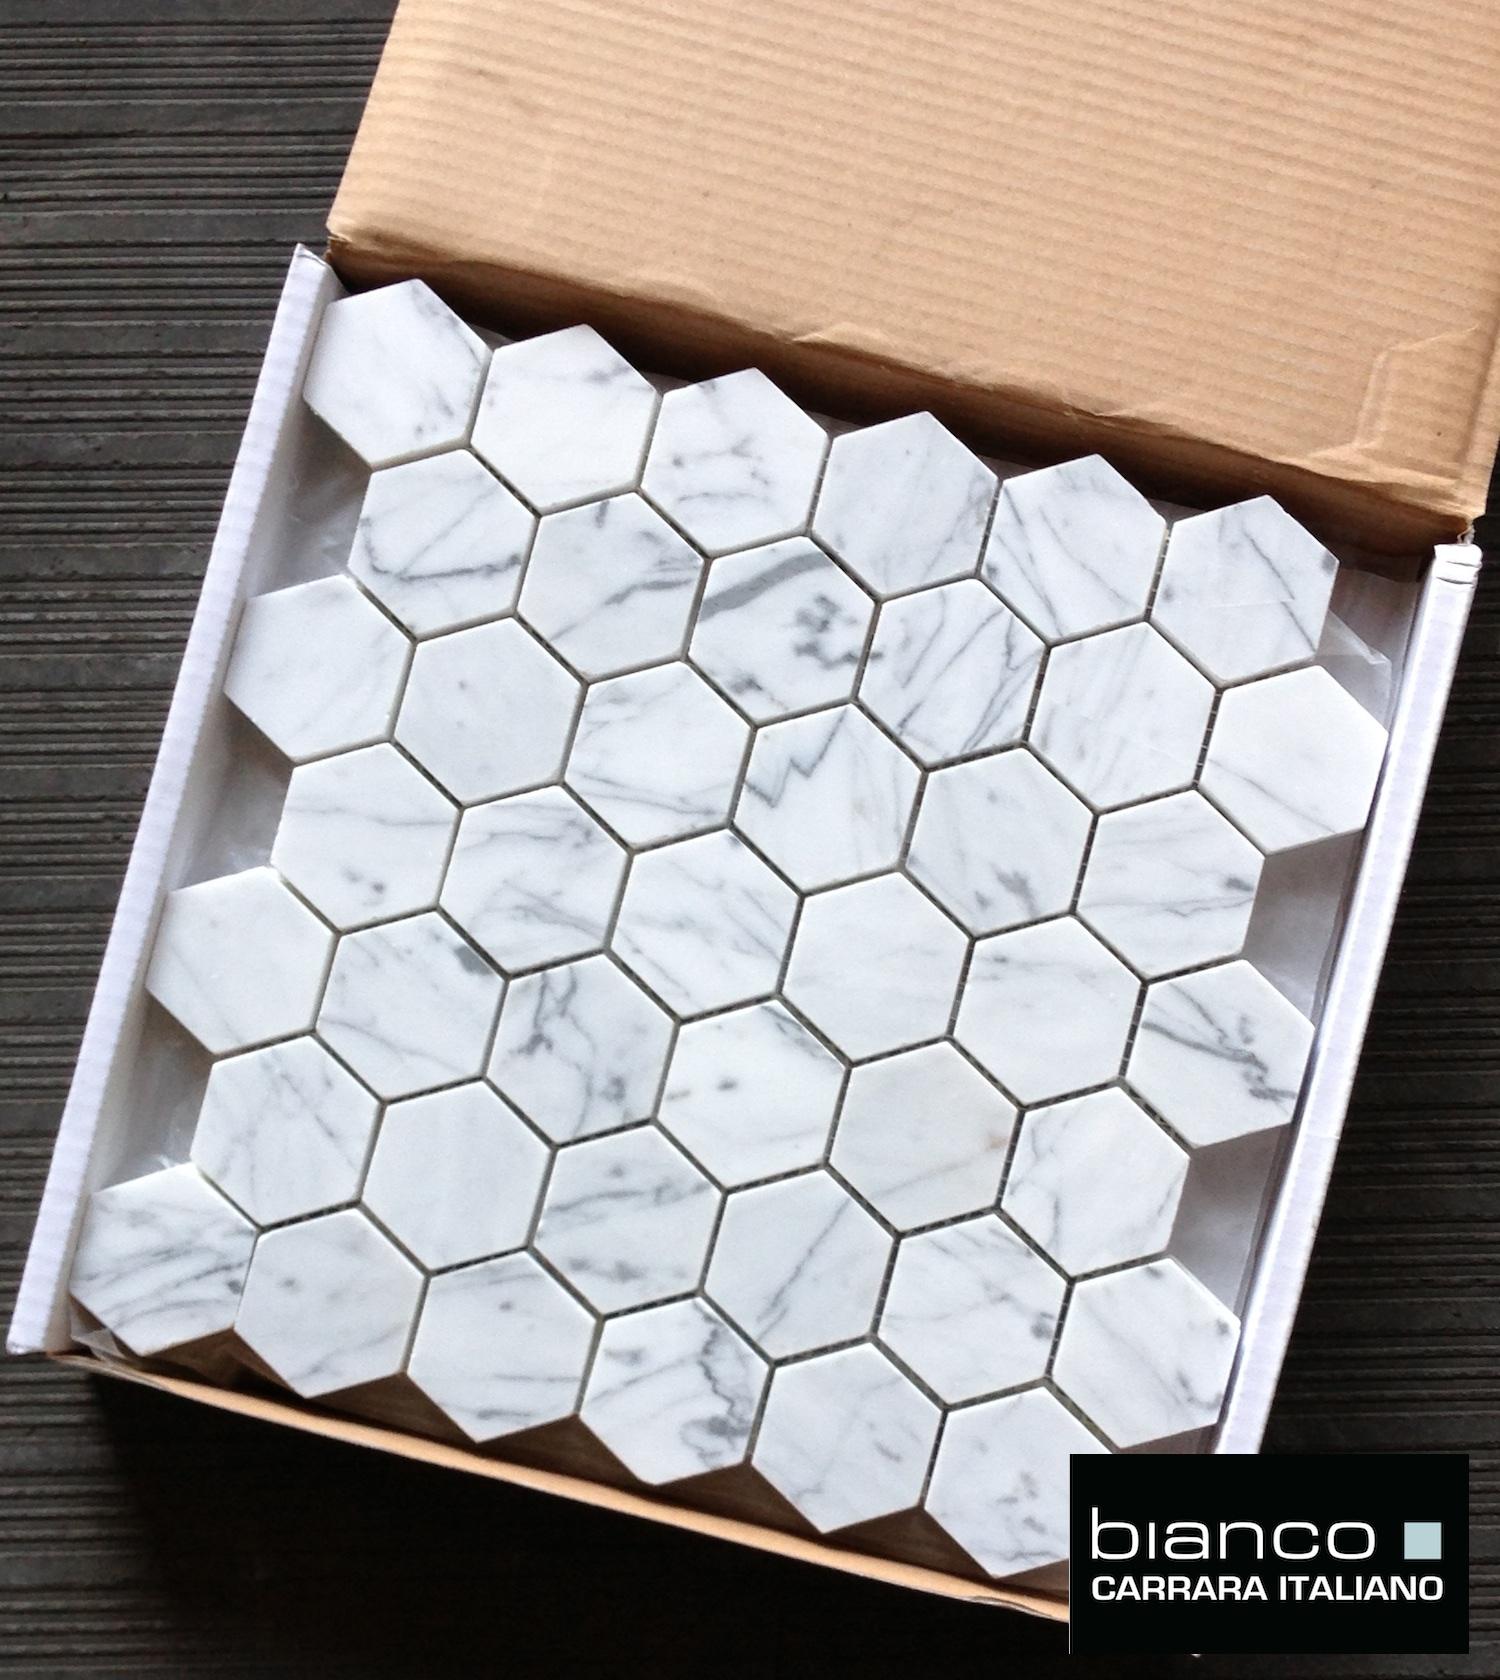 Perfect Lot Of Bianco Polished 2 Hexagon Mosaic Tile